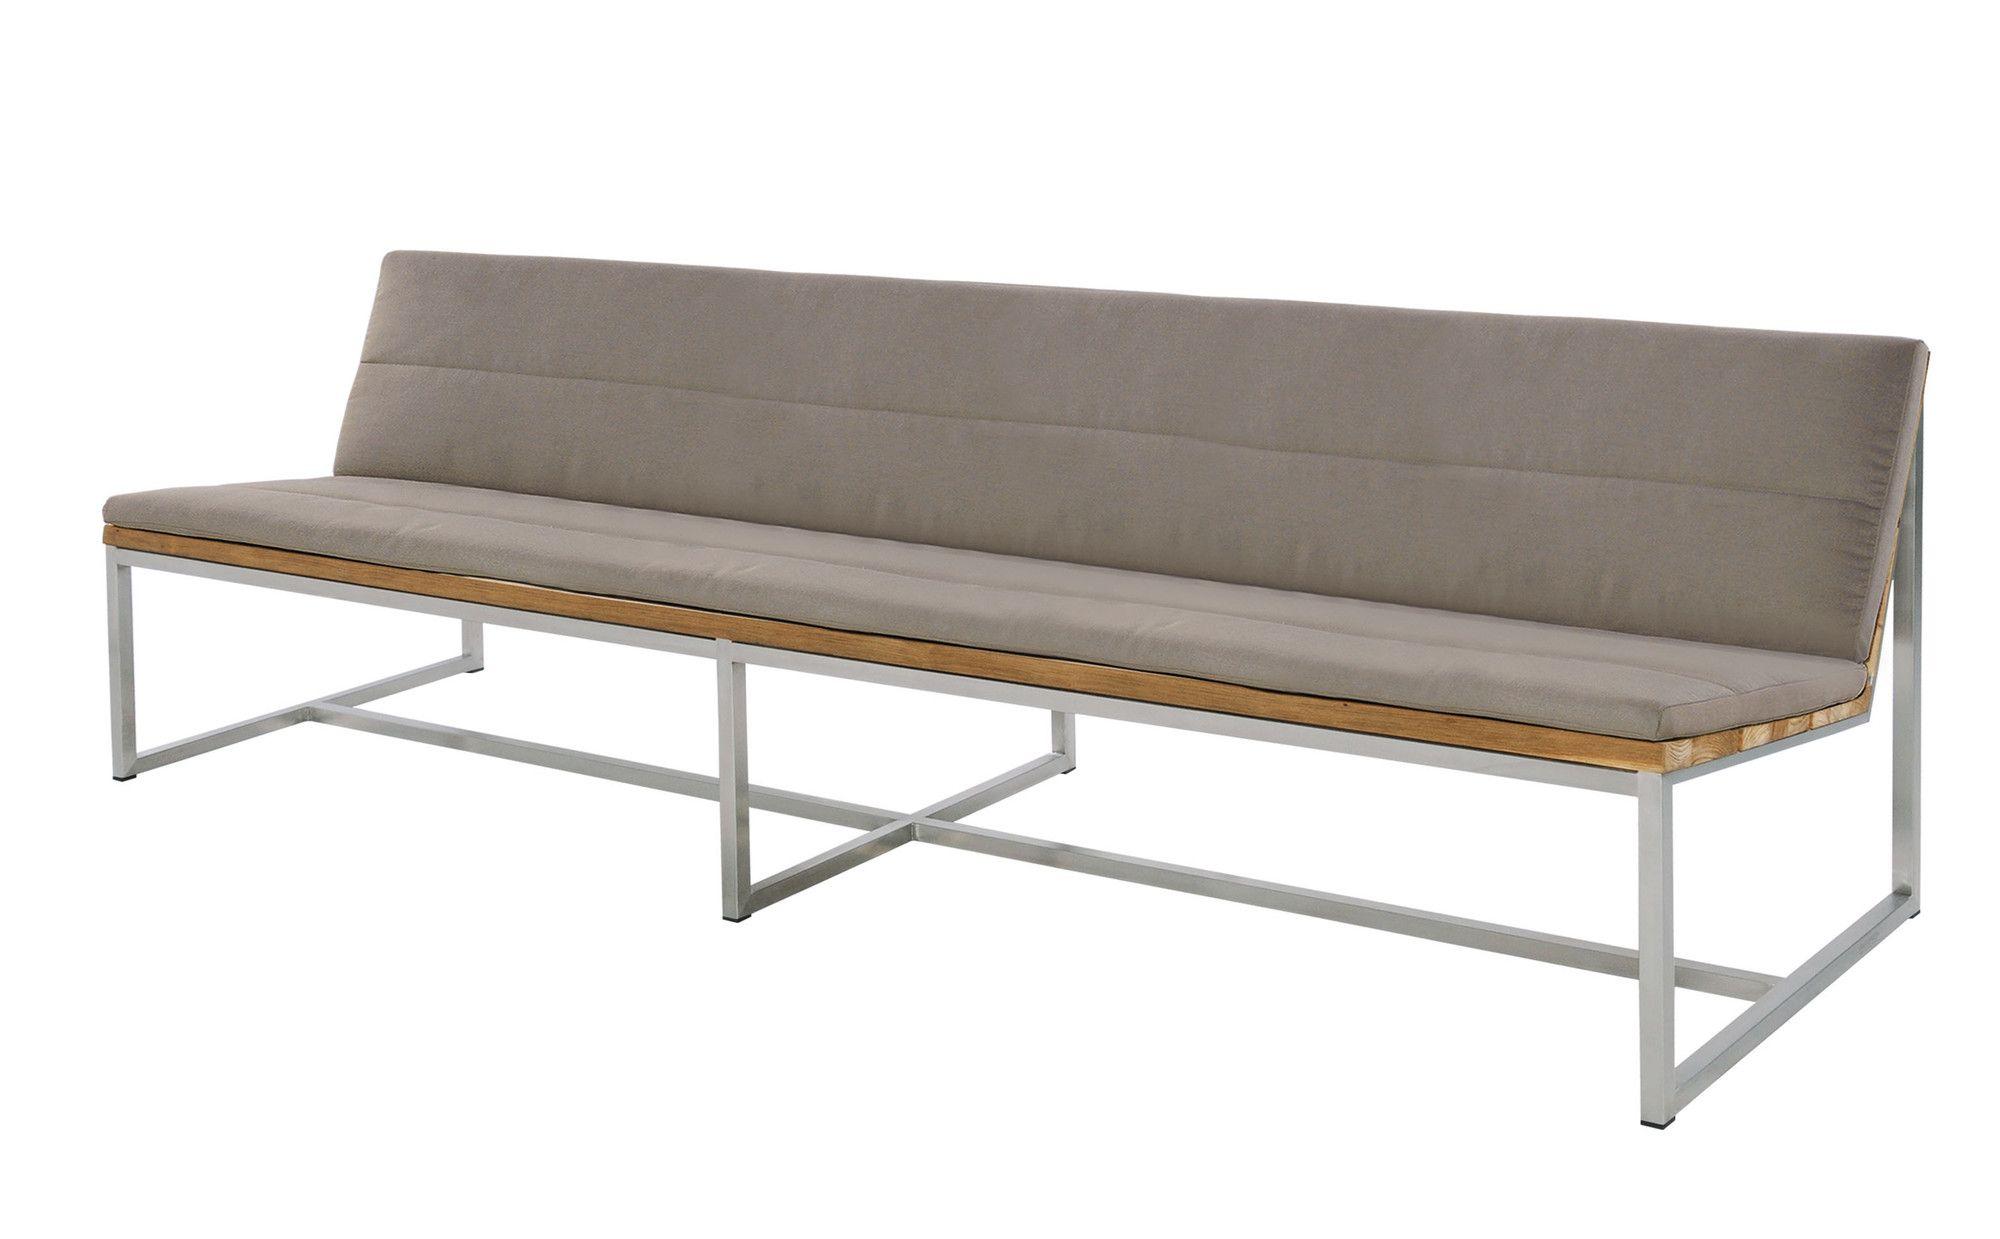 Brilliant Mamagreen Oko Teak Stainless Steel Bench With Cushions Inzonedesignstudio Interior Chair Design Inzonedesignstudiocom